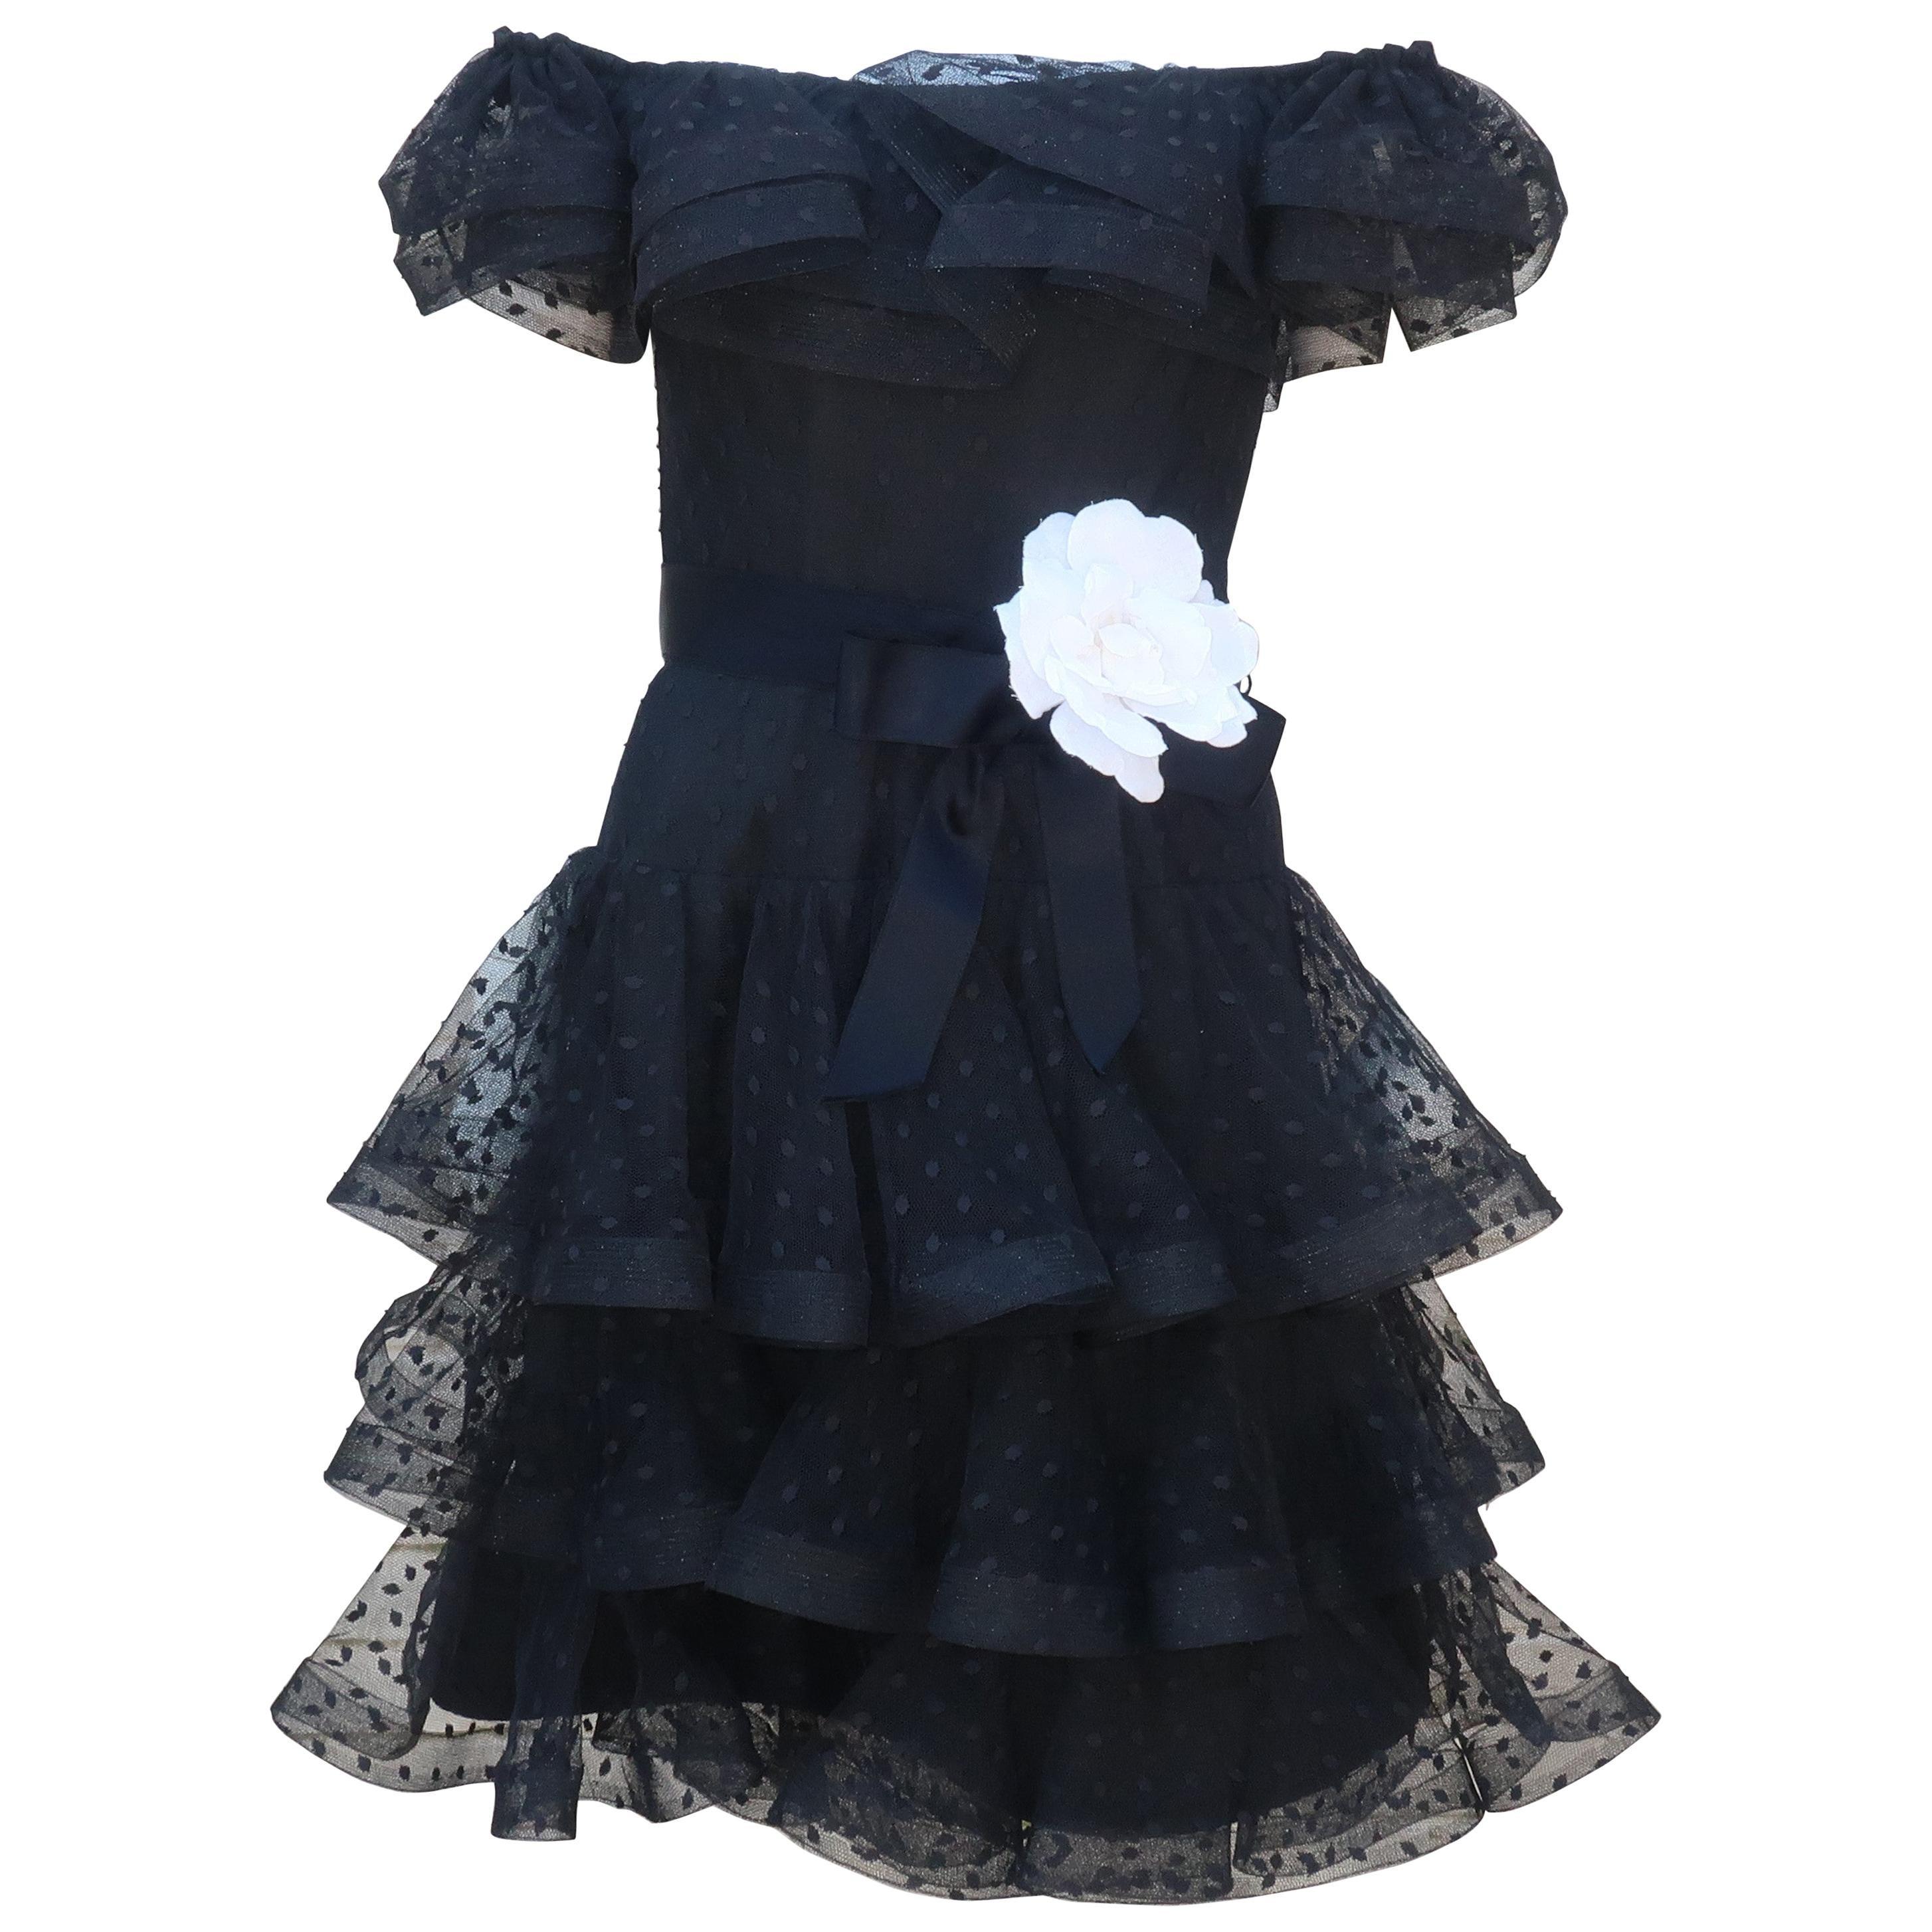 Scaasi Black Swiss Dot Tulle Cocktail Dress